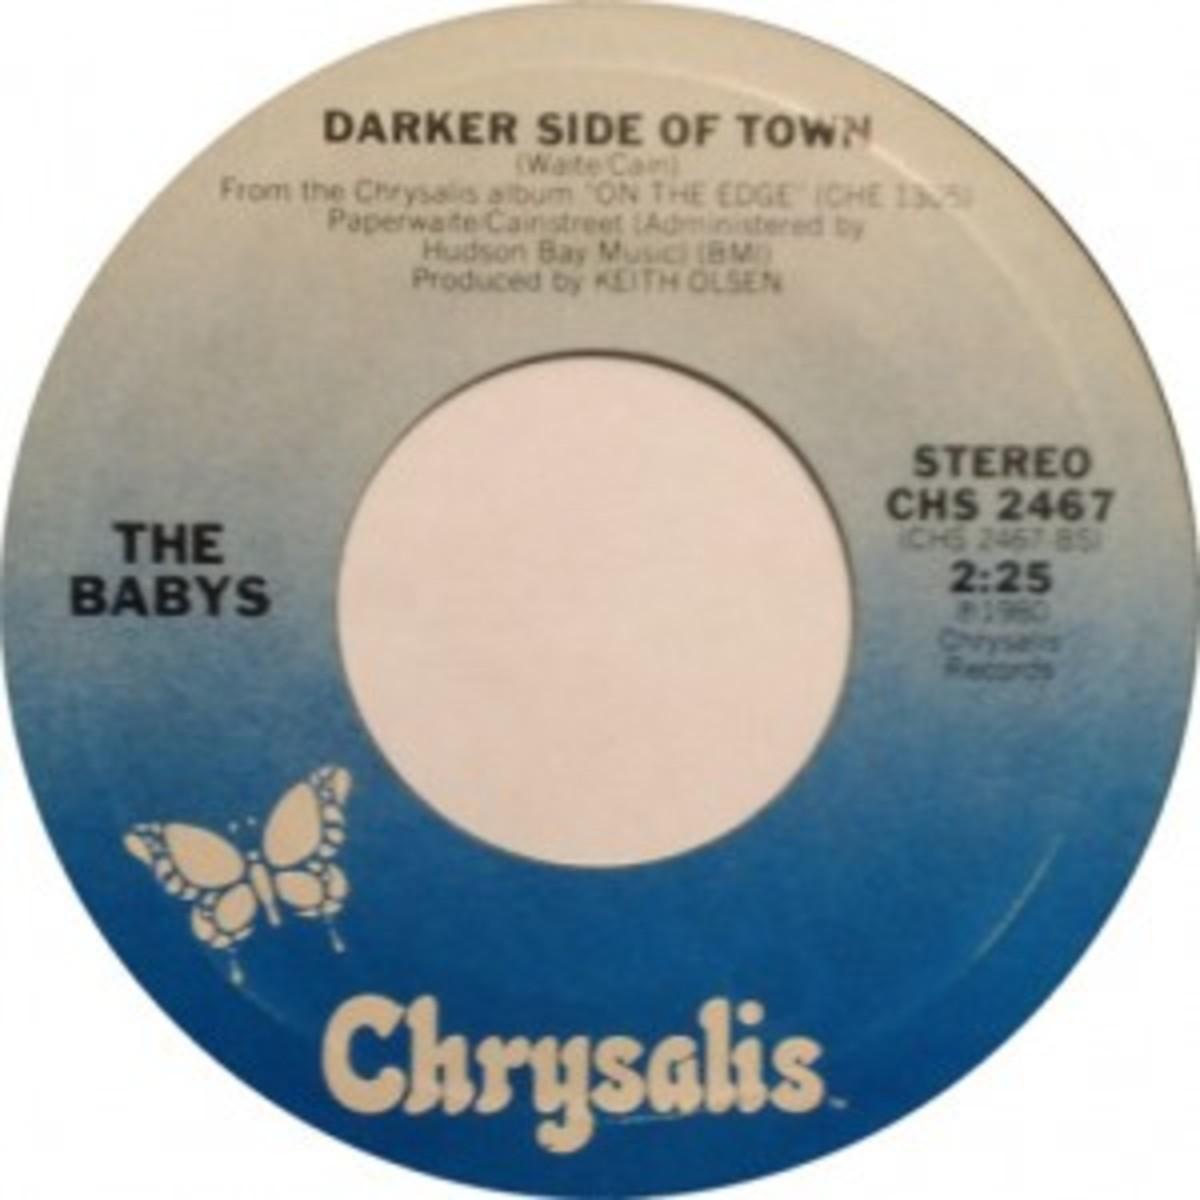 The Babys Darker Side of Town Chrysalis single